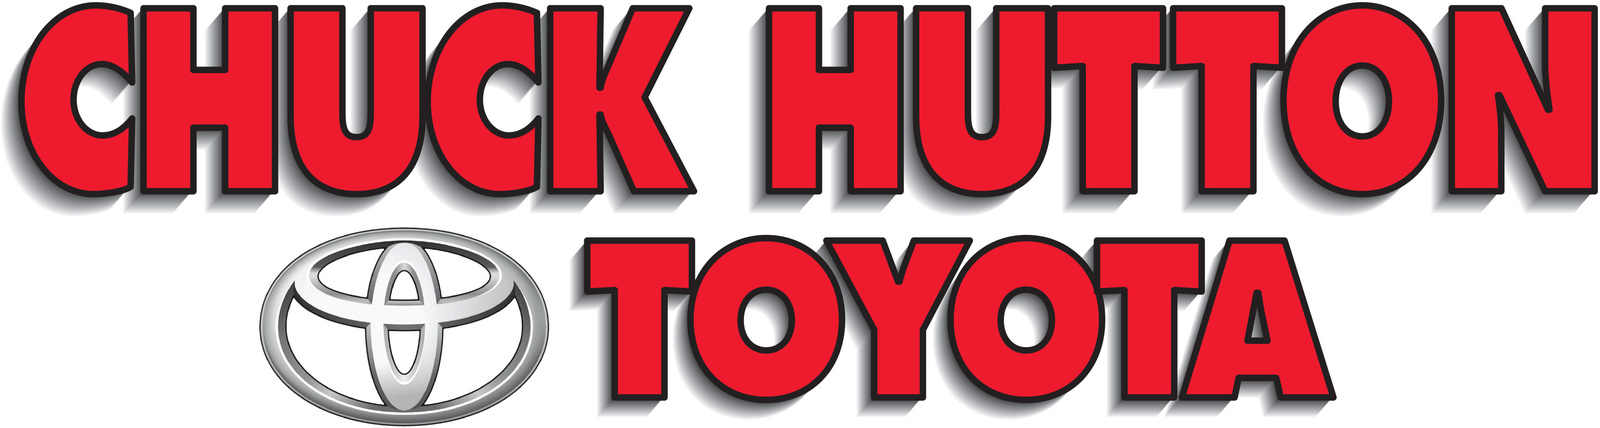 search new chuck hutton chevrolet. Black Bedroom Furniture Sets. Home Design Ideas